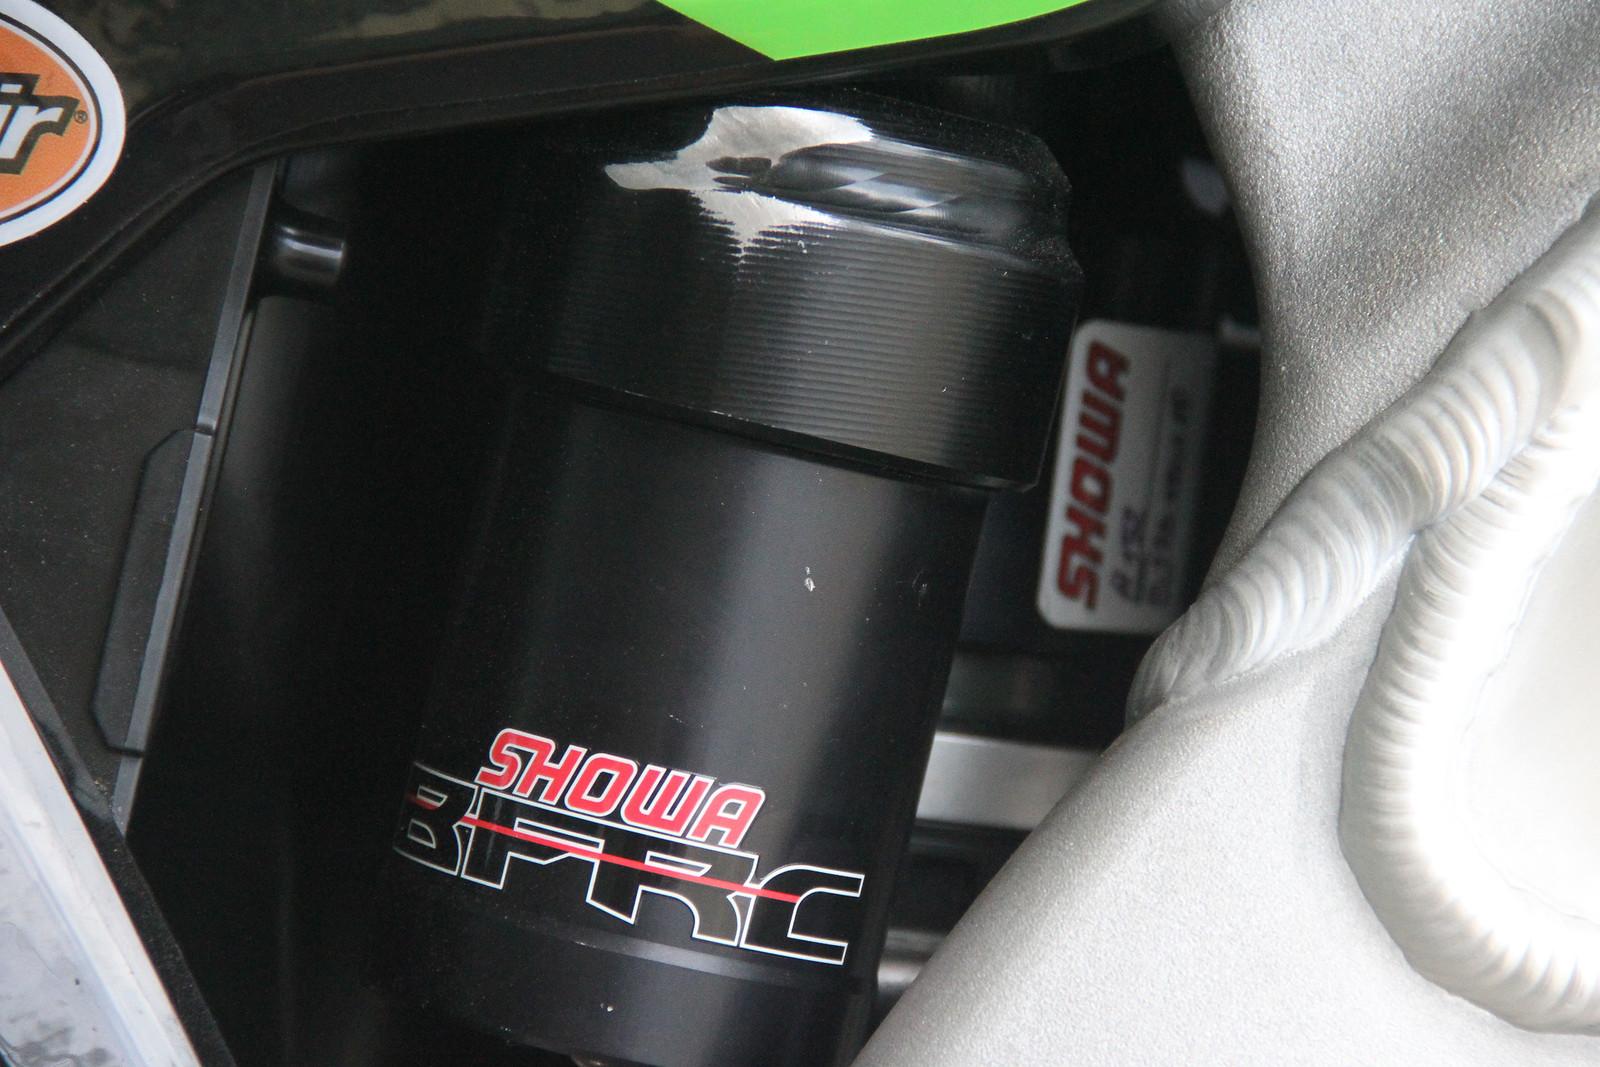 Petrov's Showa BFRC Shock - ayearinmx - Motocross Pictures - Vital MX